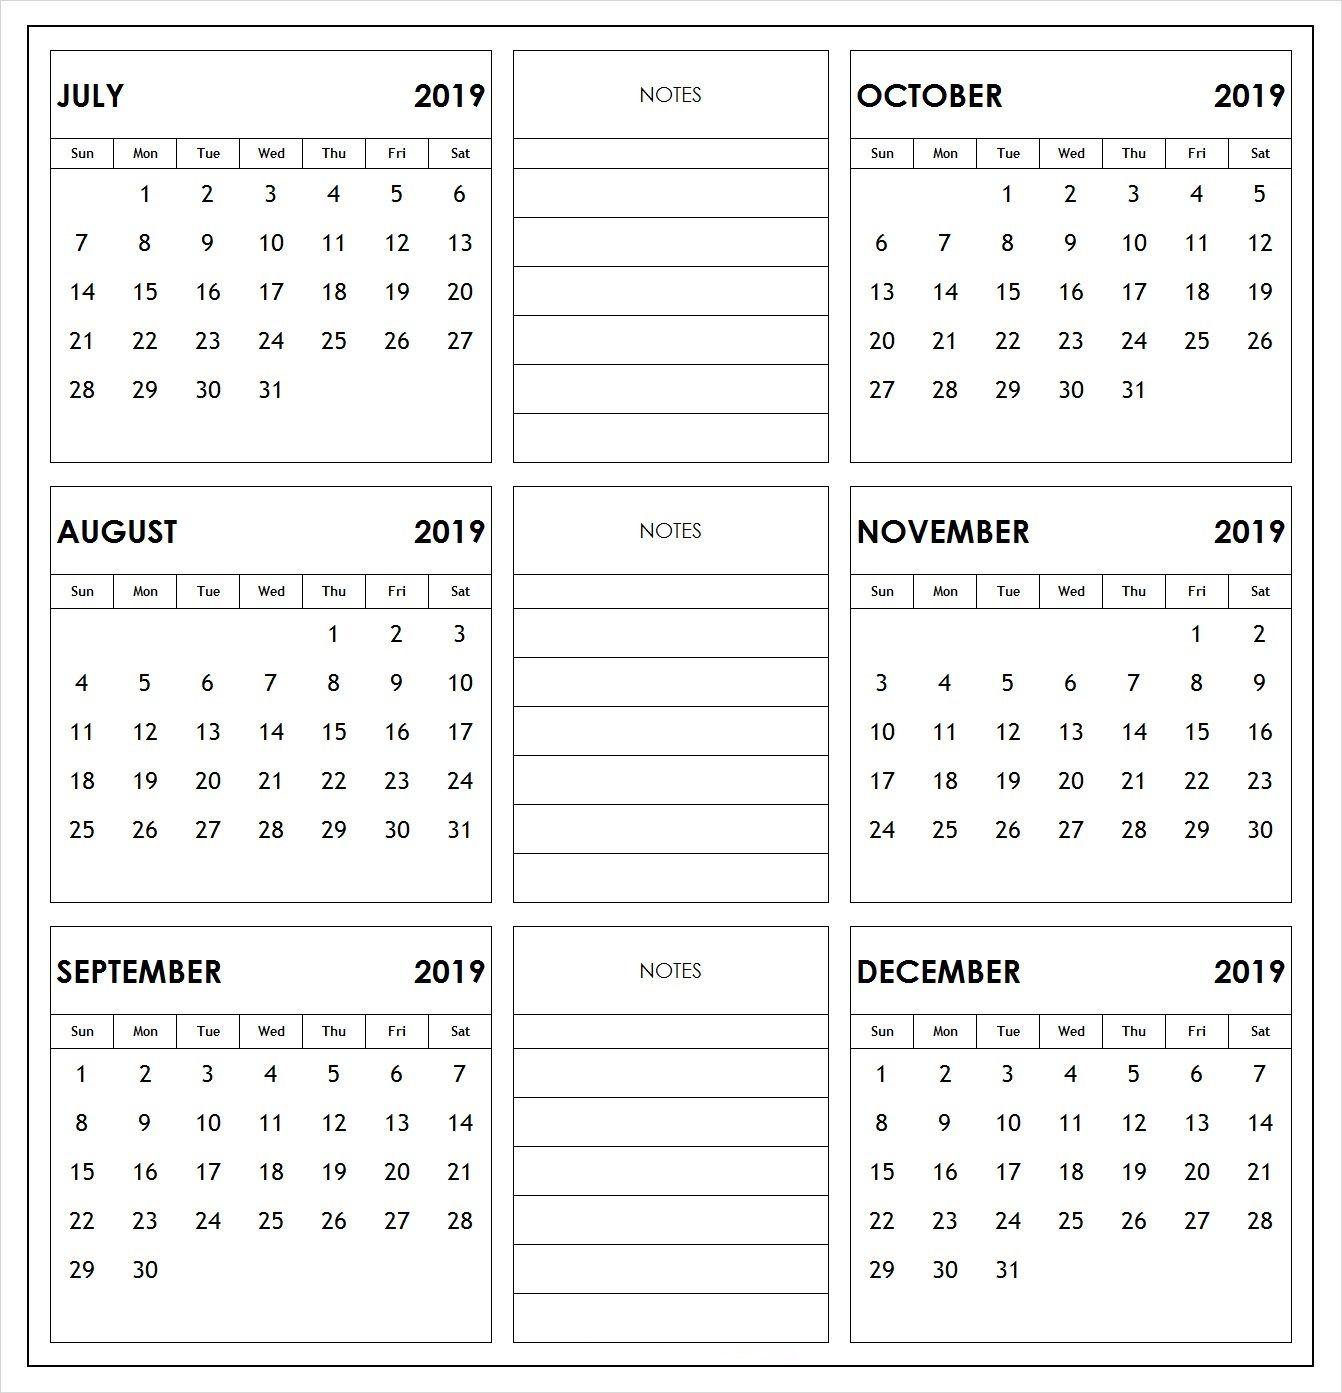 2019 Half Year Print Calendar   Print Calendar, 2019